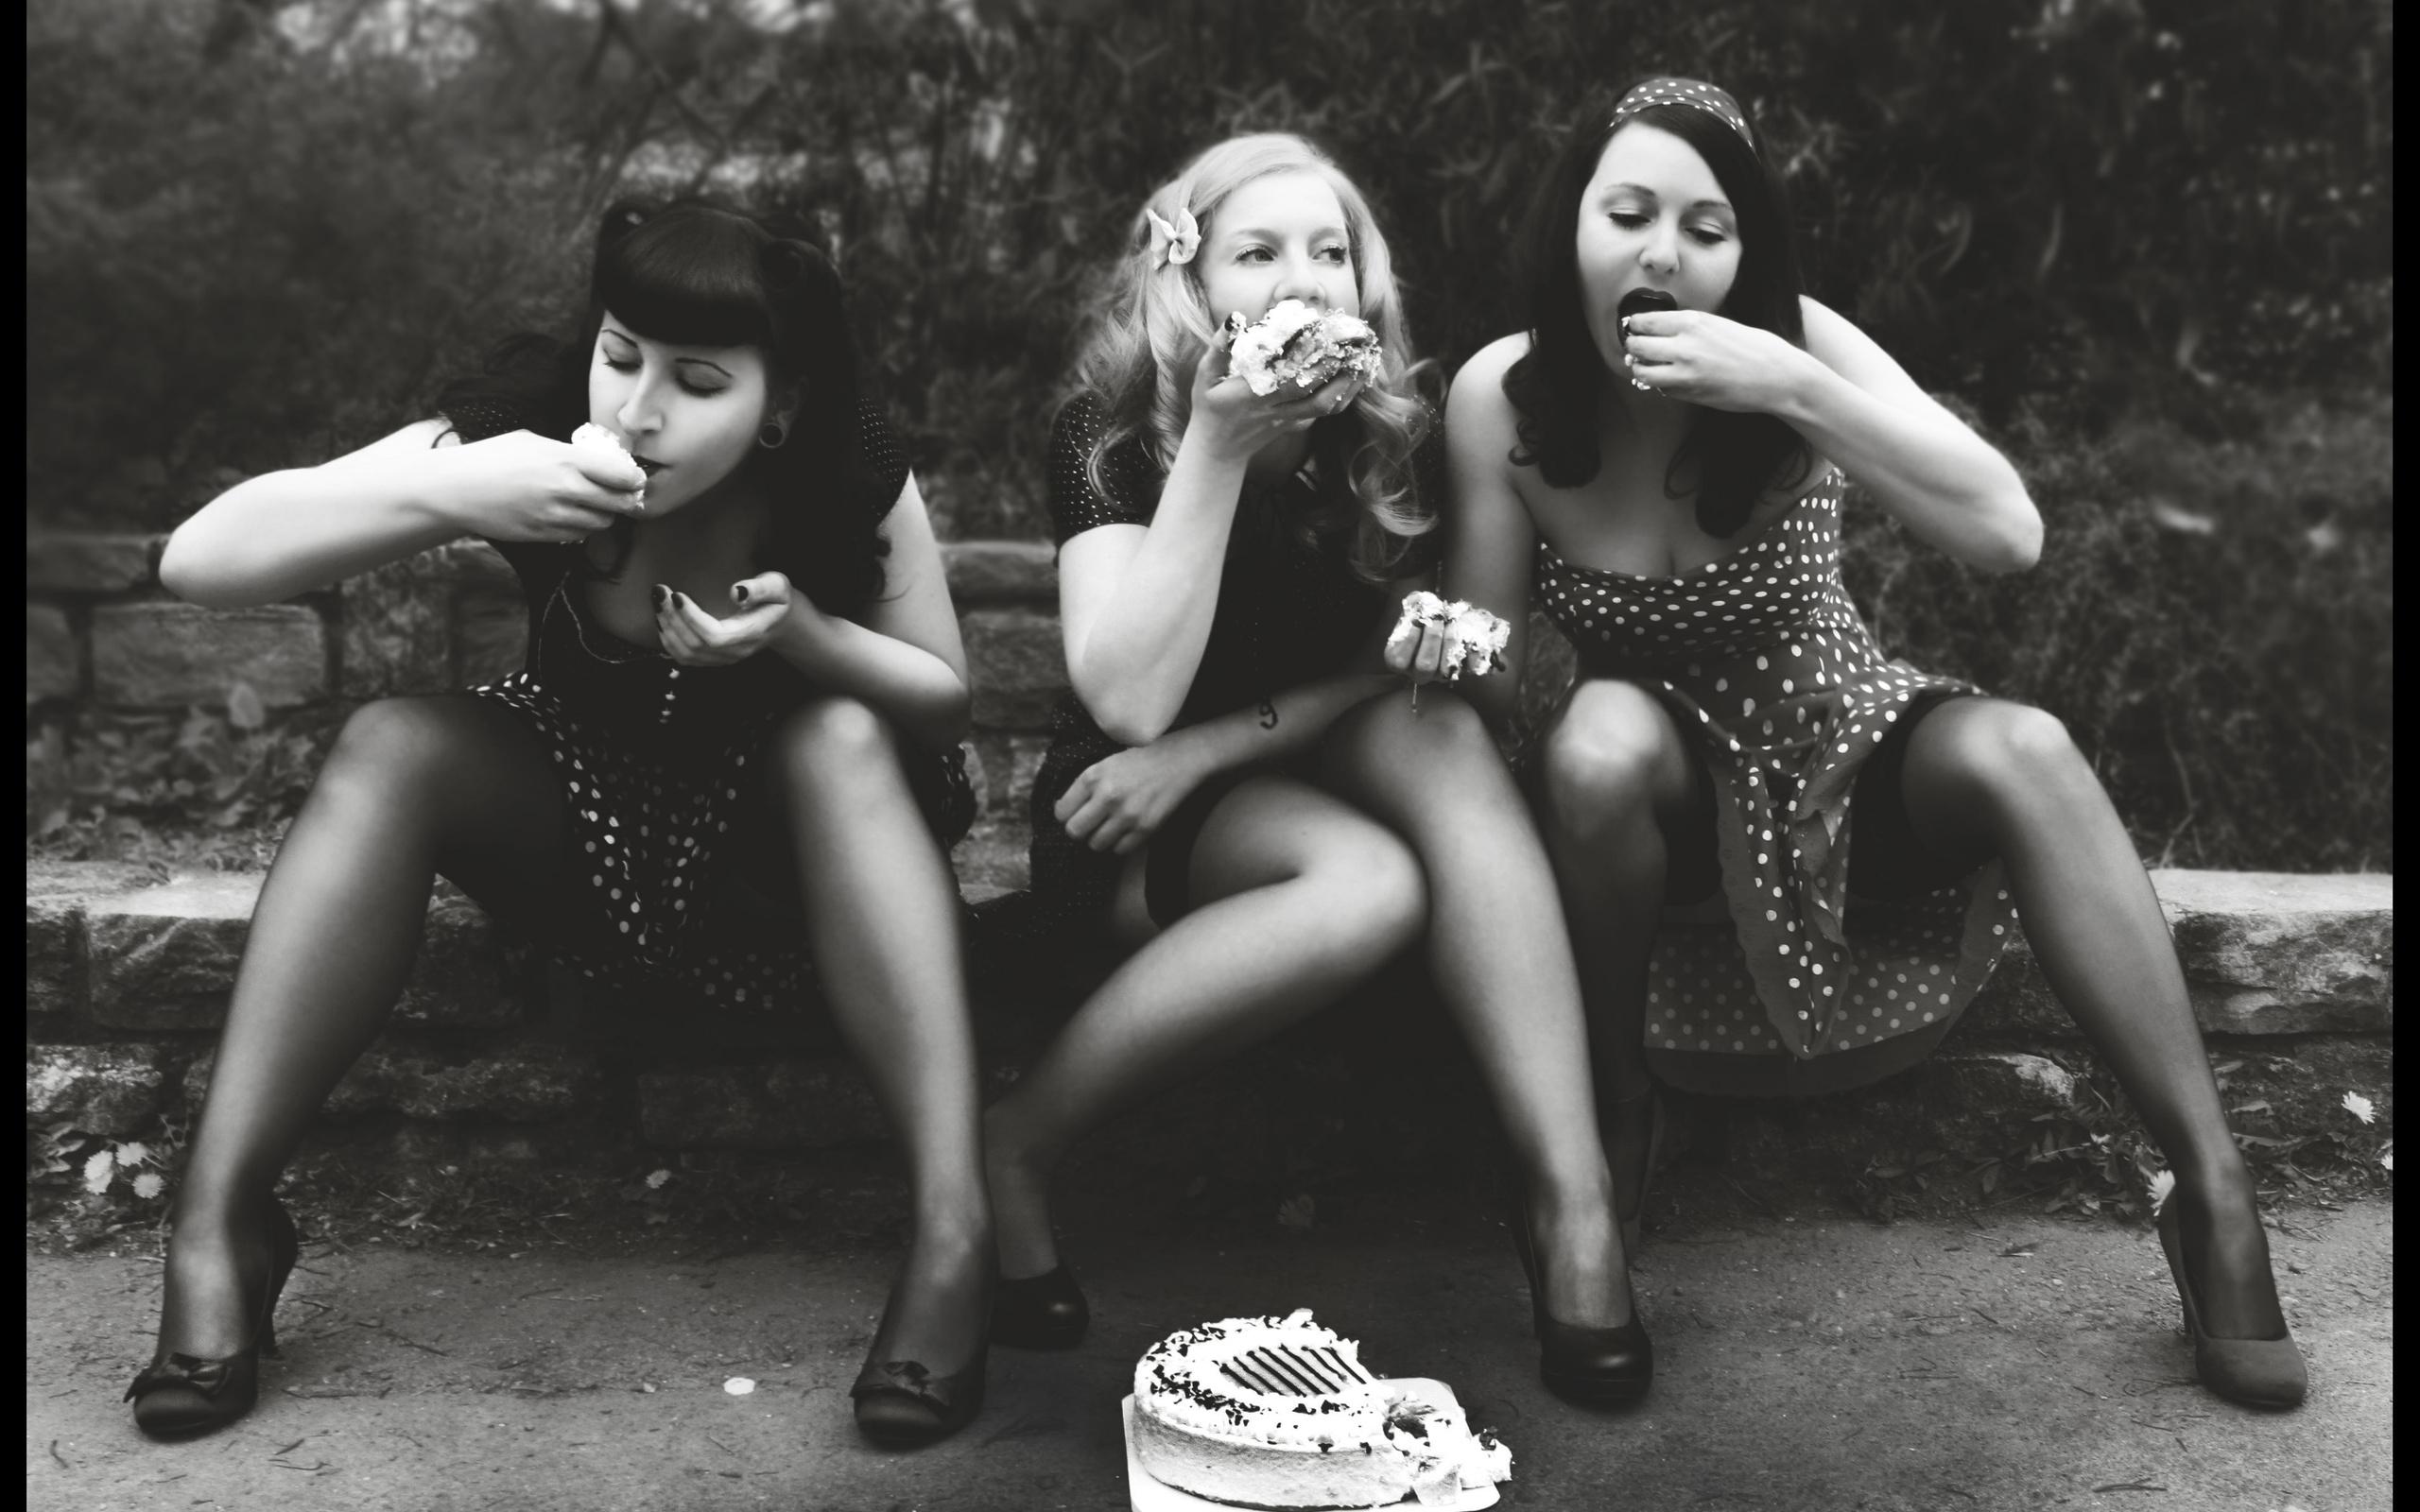 white, black, old, monochrome, model, portrait, nature, sitting, bow, photography, dress, dots, cake, vintage